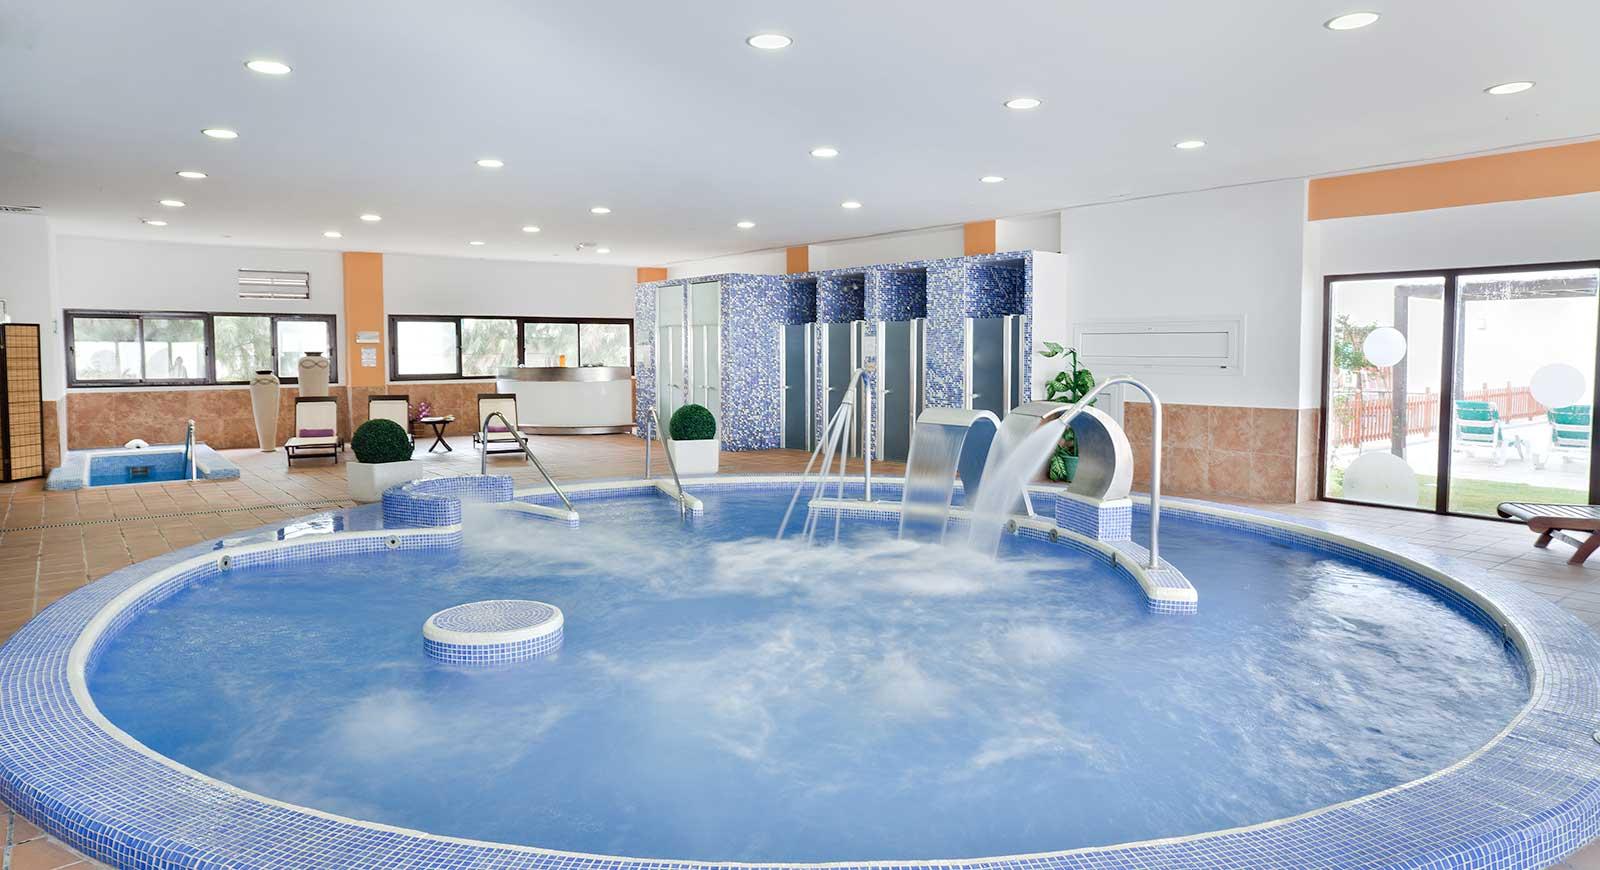 236-spa-6-hotel-barcelo-cabo-de-gata_tcm20-8417_w1600_h870_n.jpg